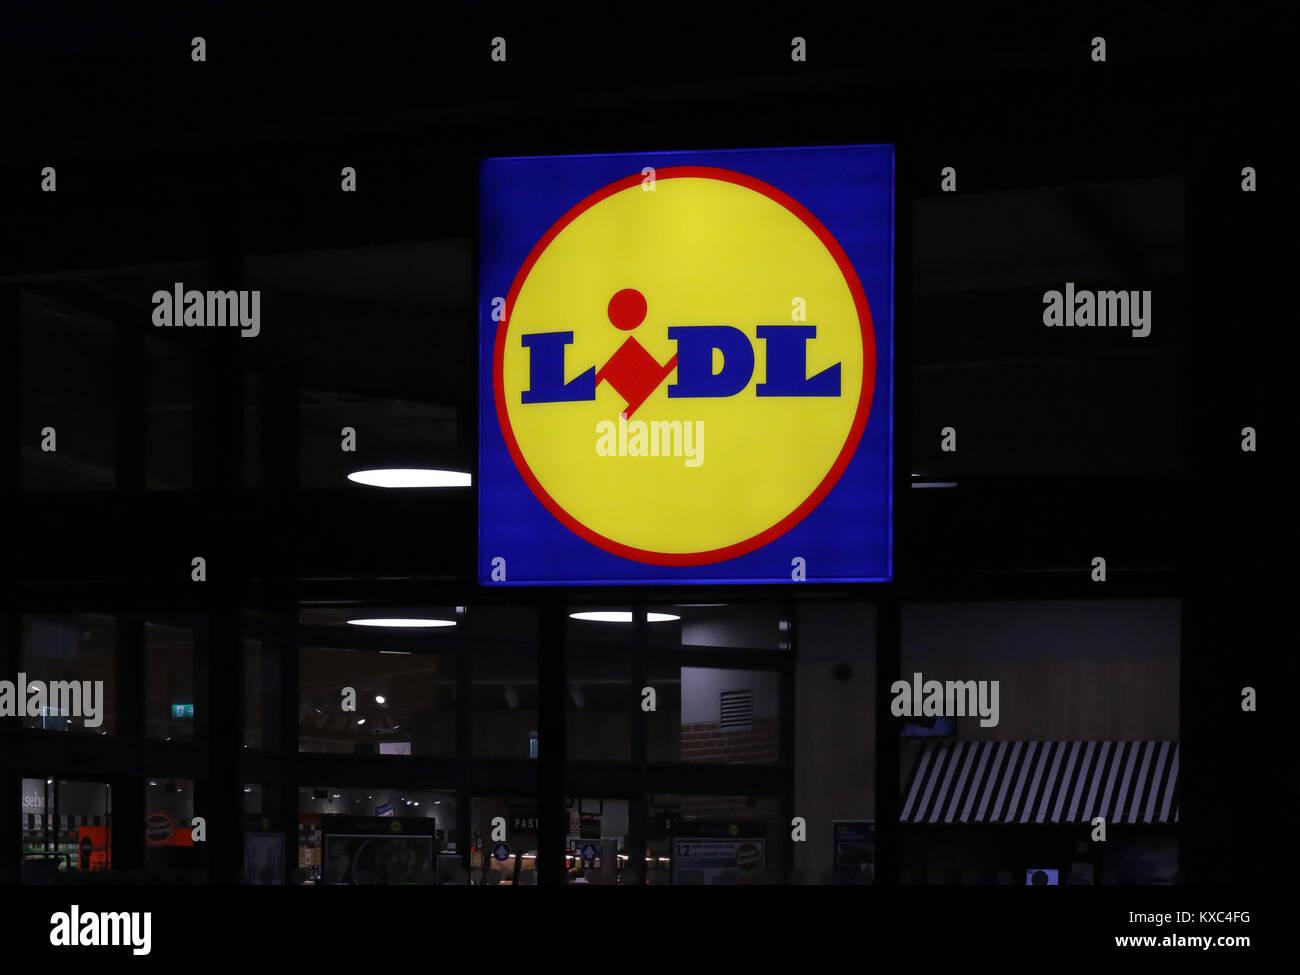 Illuminated Lidl sign at Lidl Supermarket - Stock Image